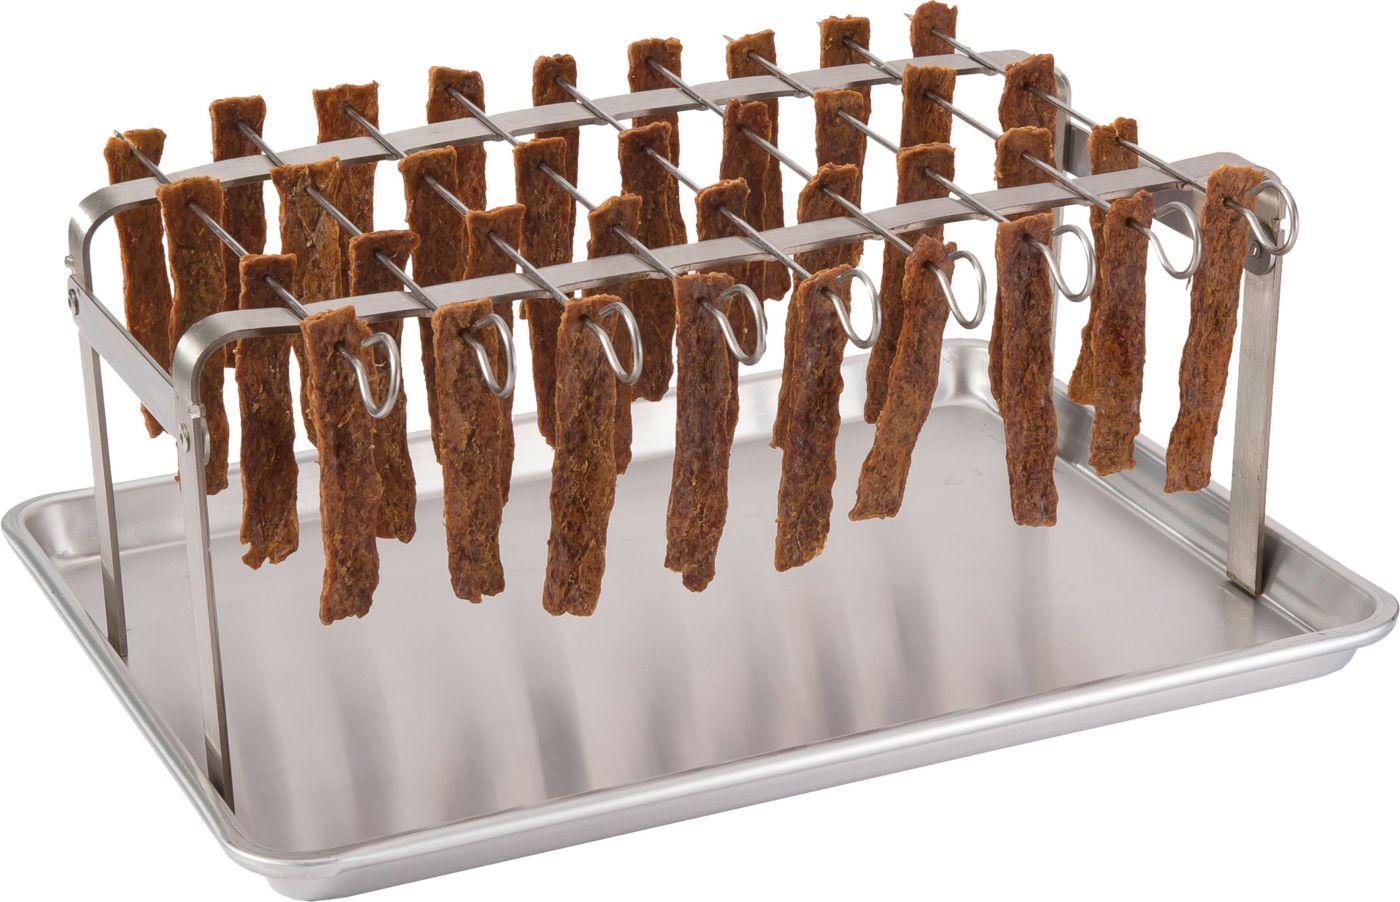 LEM Jerky Hanger with 9 Skewers and Seasoning